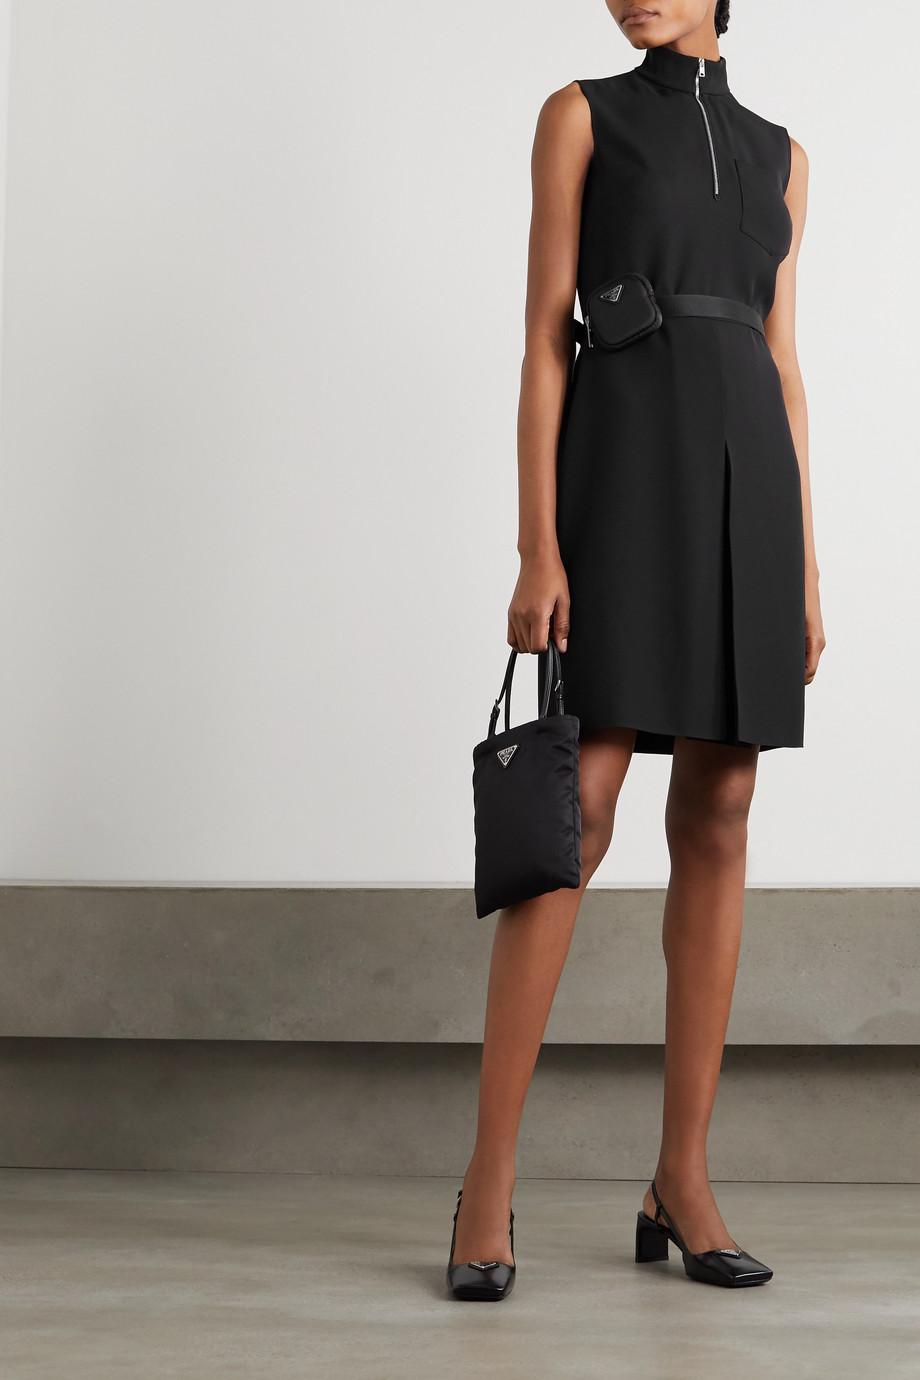 Prada Mini-robe en serge à ceinture et à ornements